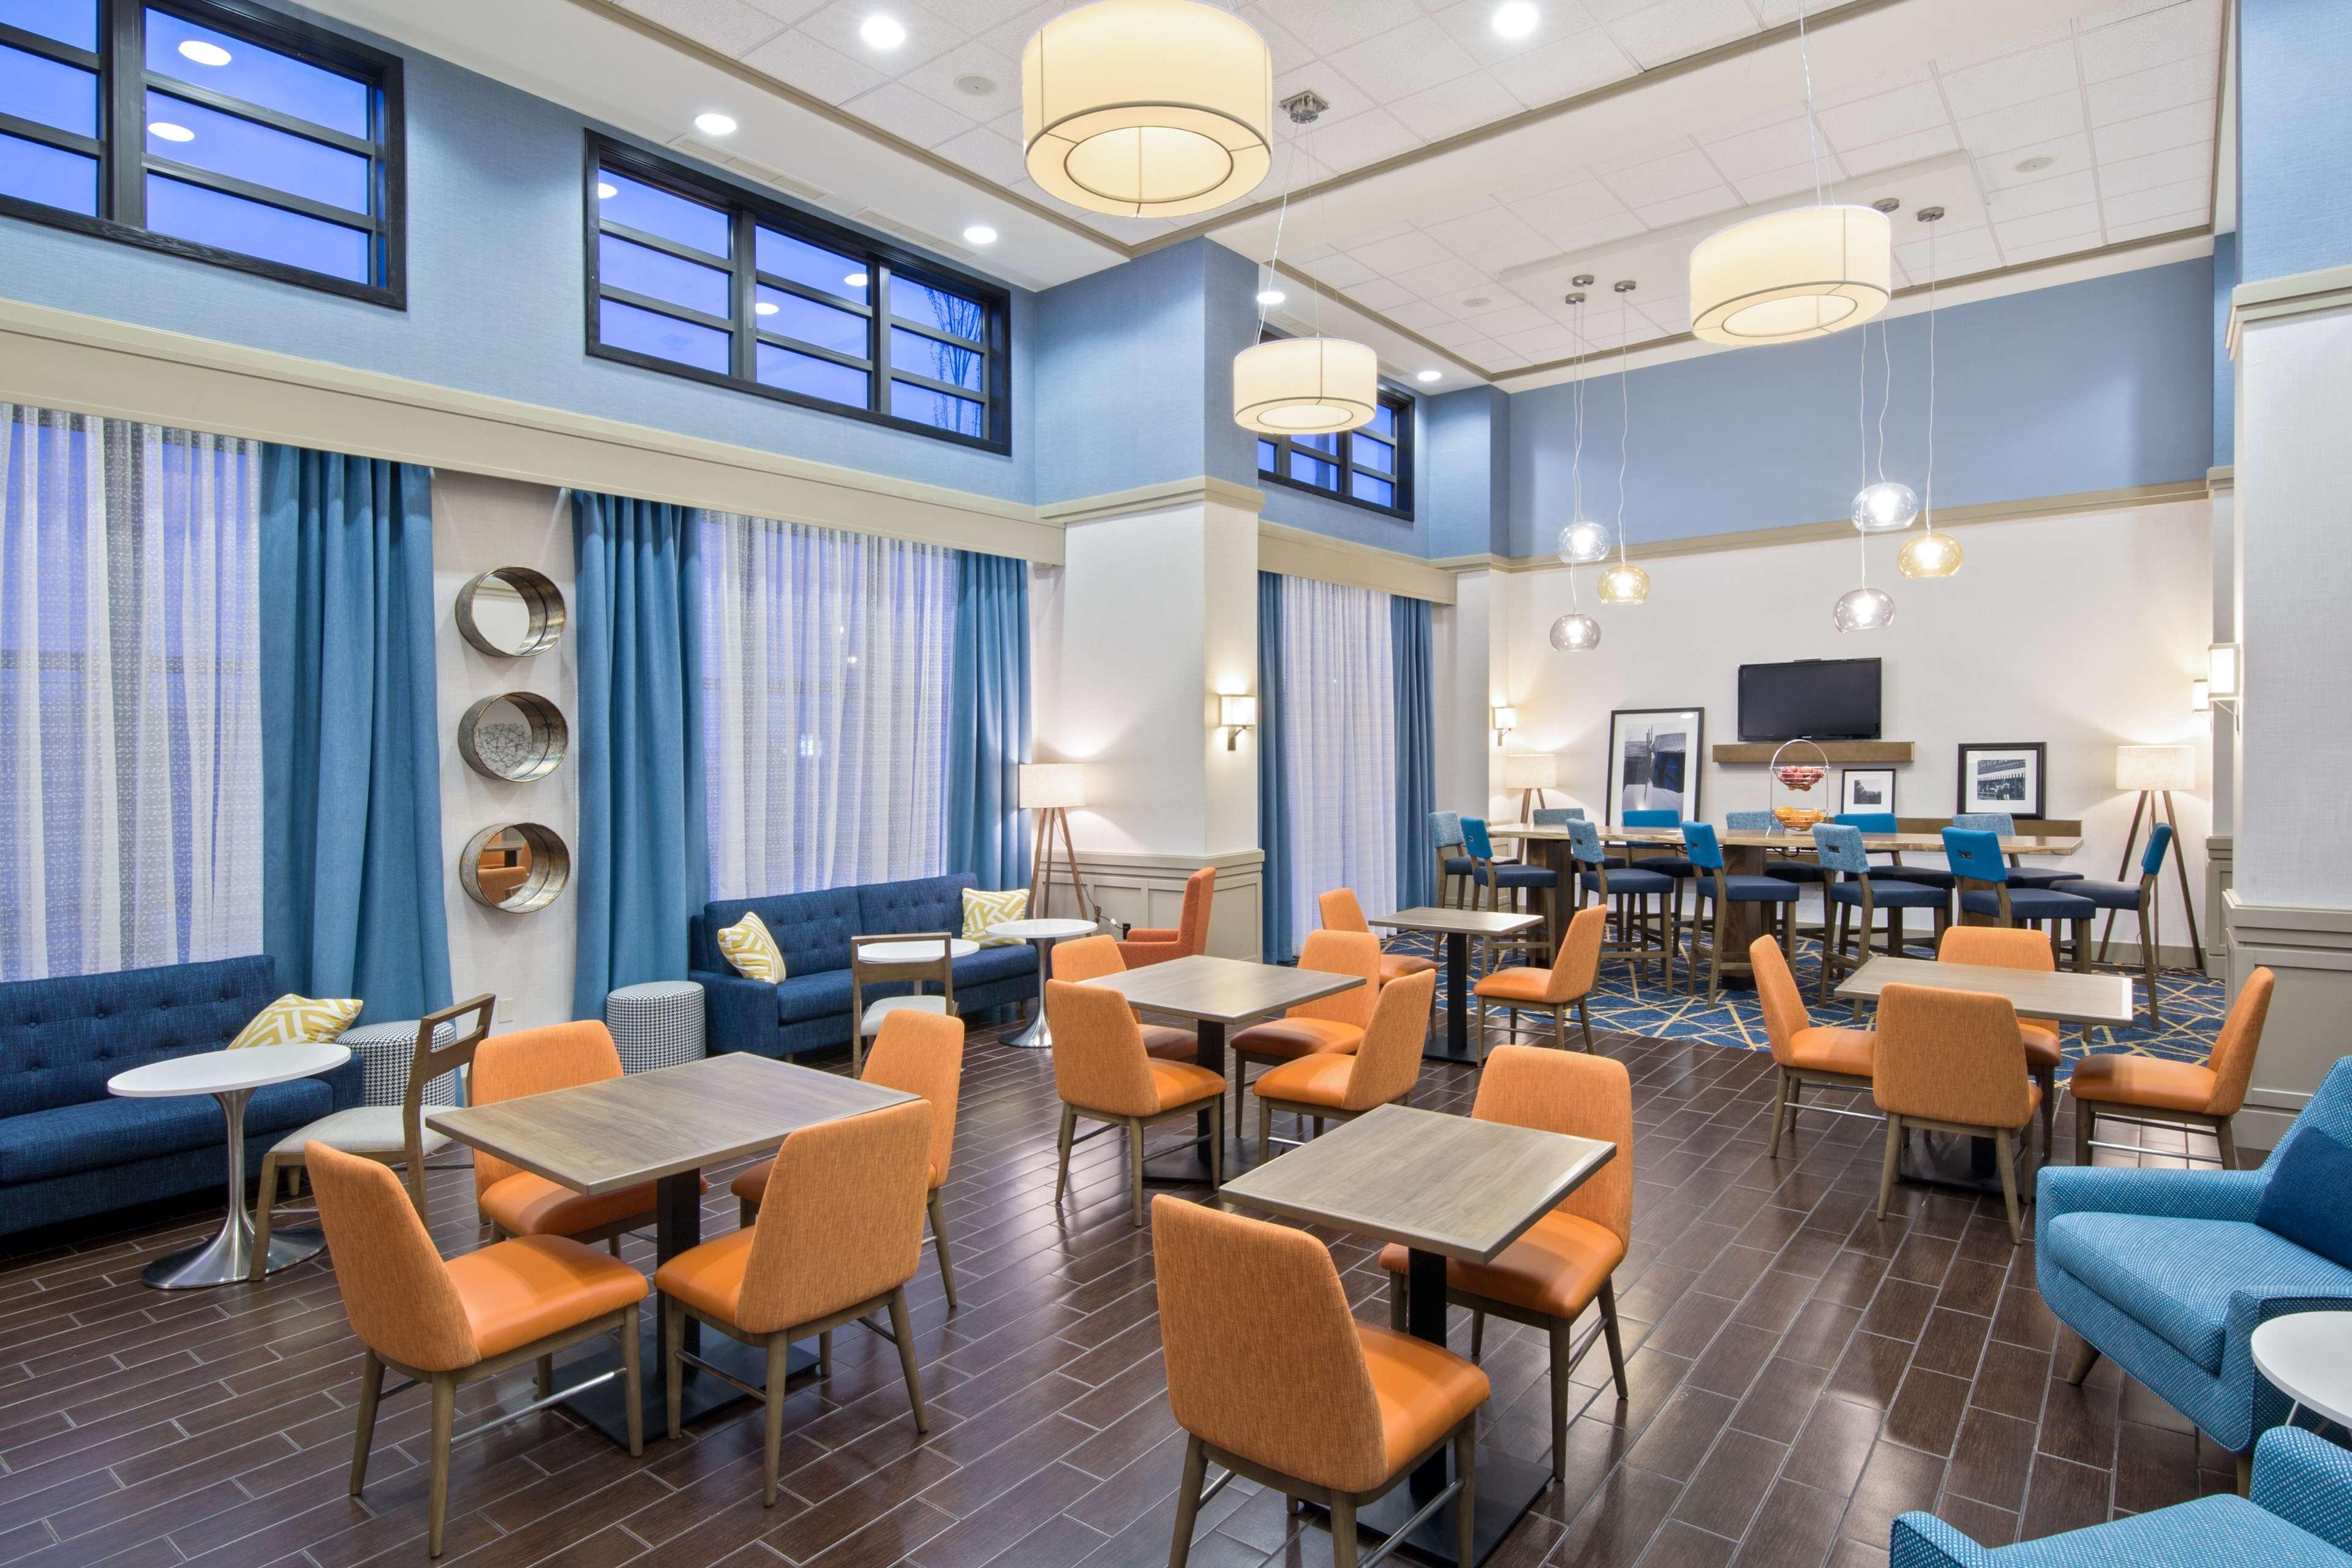 Hampton Inn & Suites Spokane Valley image 3